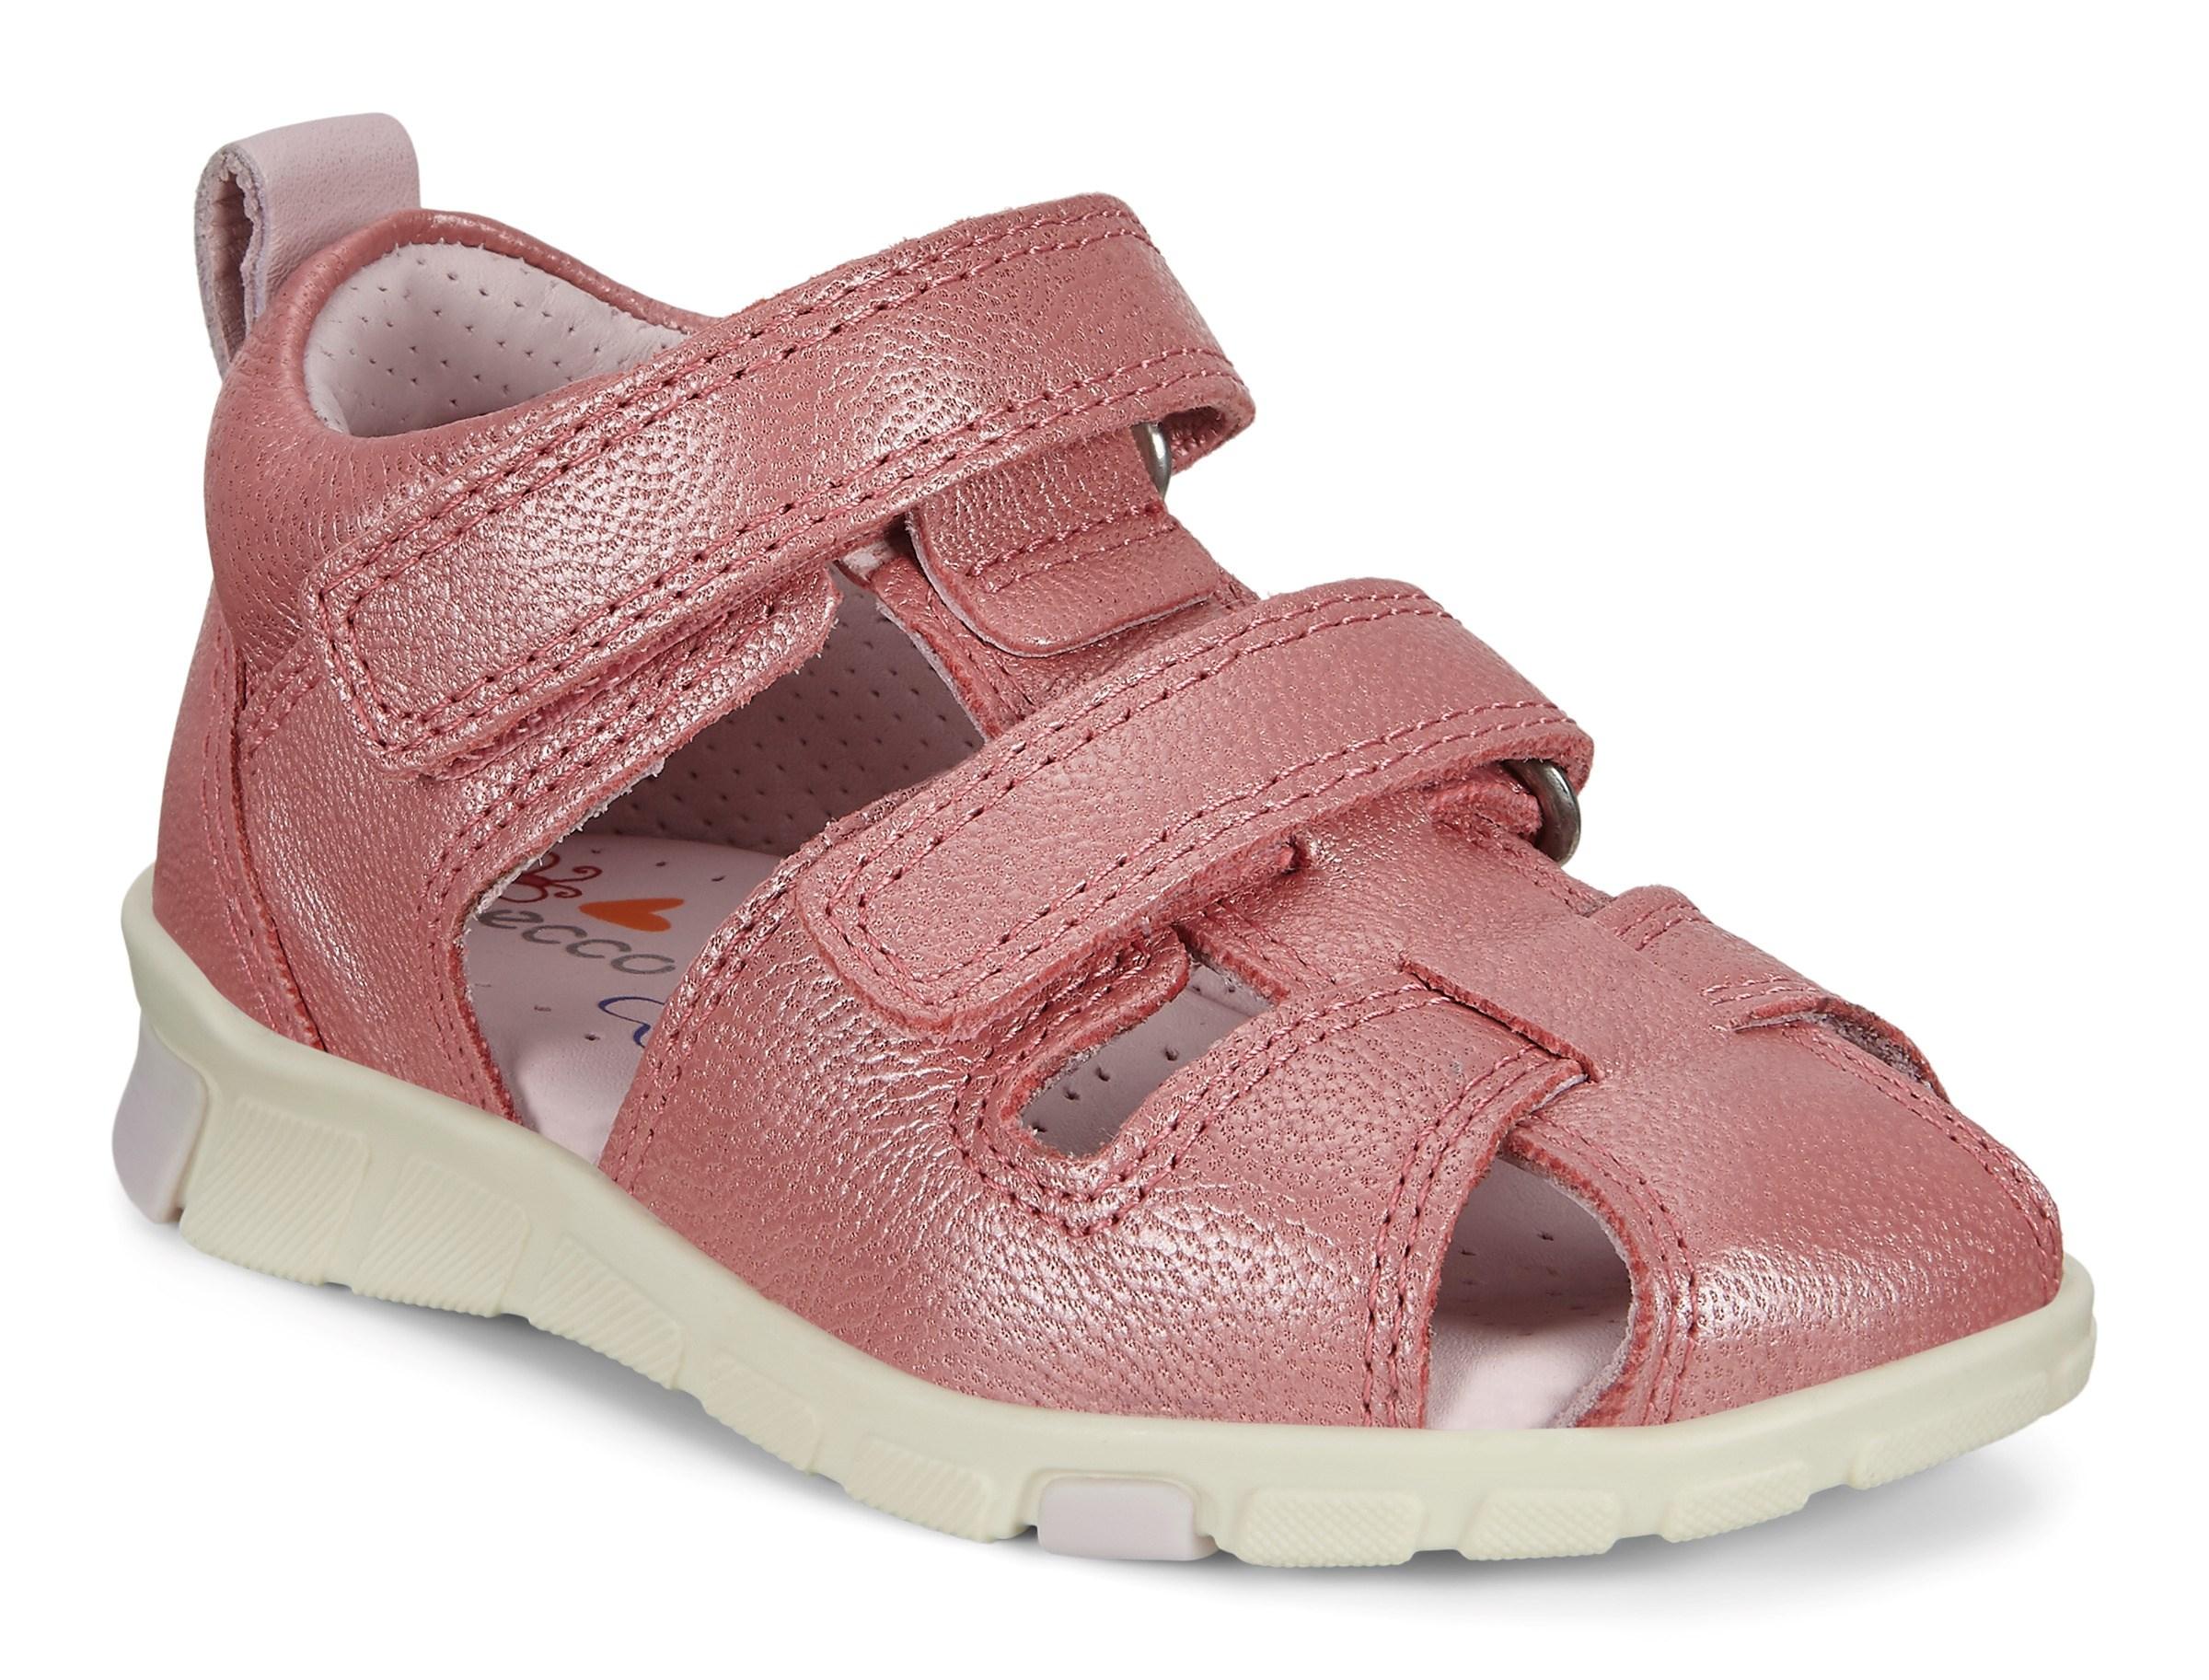 ecco sandaler str 21, ecco outlet Danmark Kvinder Ecco